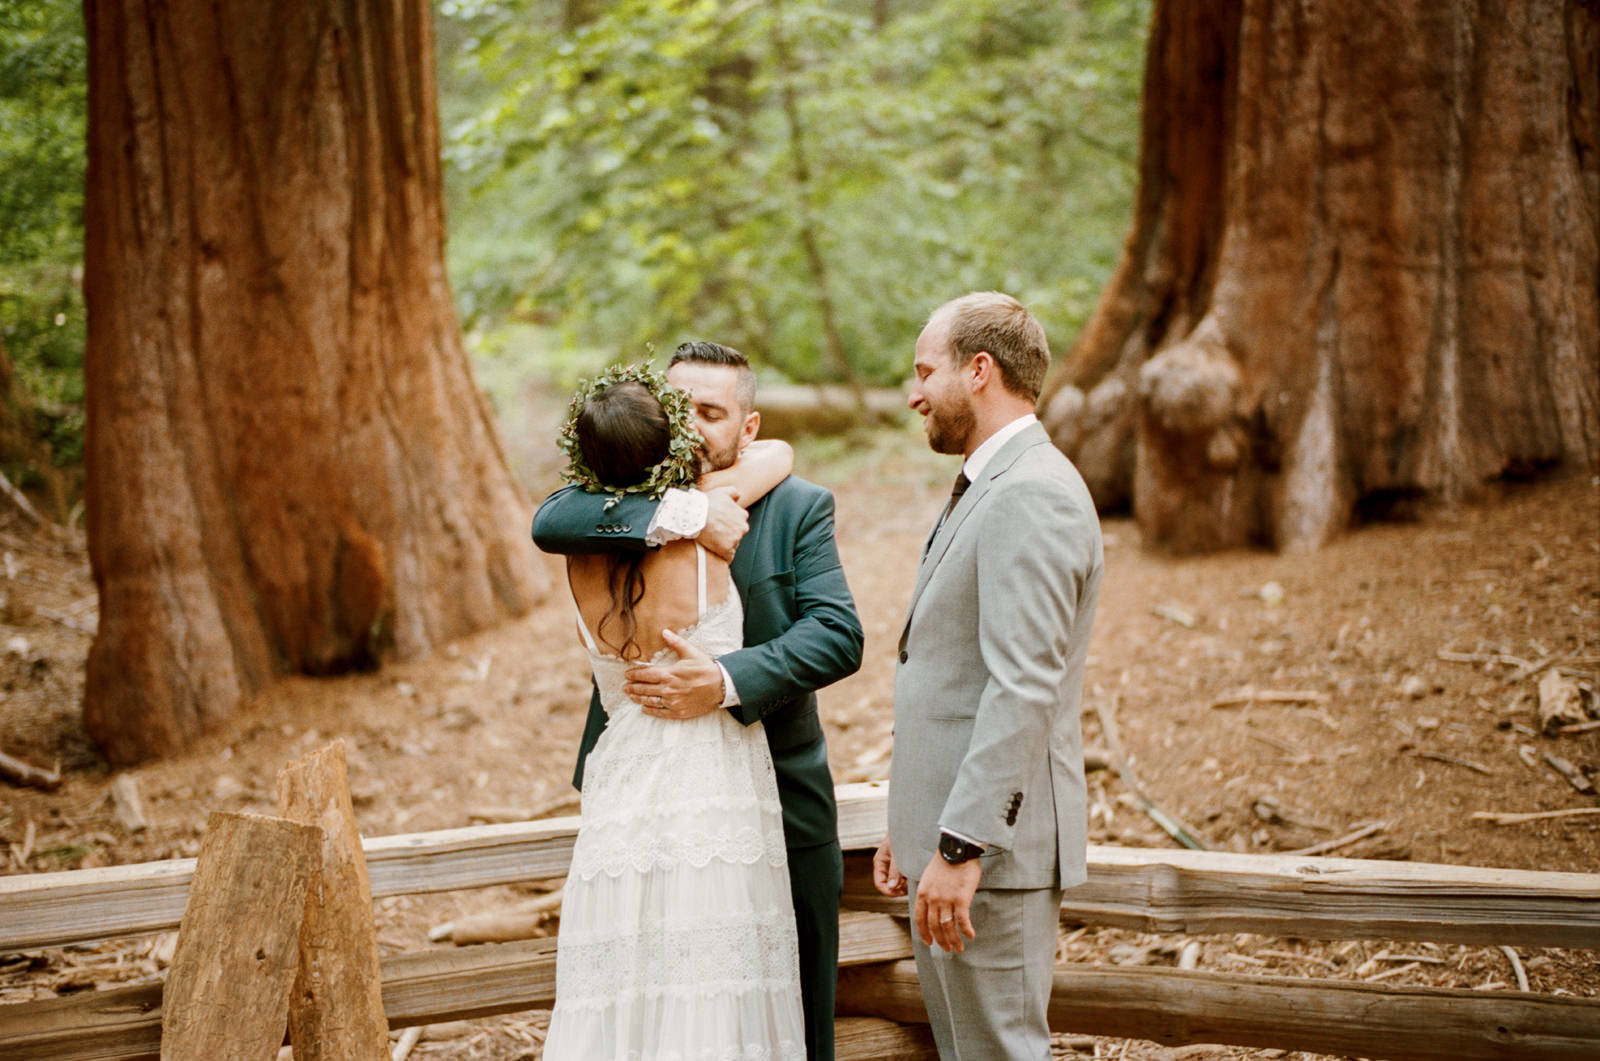 yosemite-intimate-wedding-042 YOSEMITE INTIMATE WEDDING